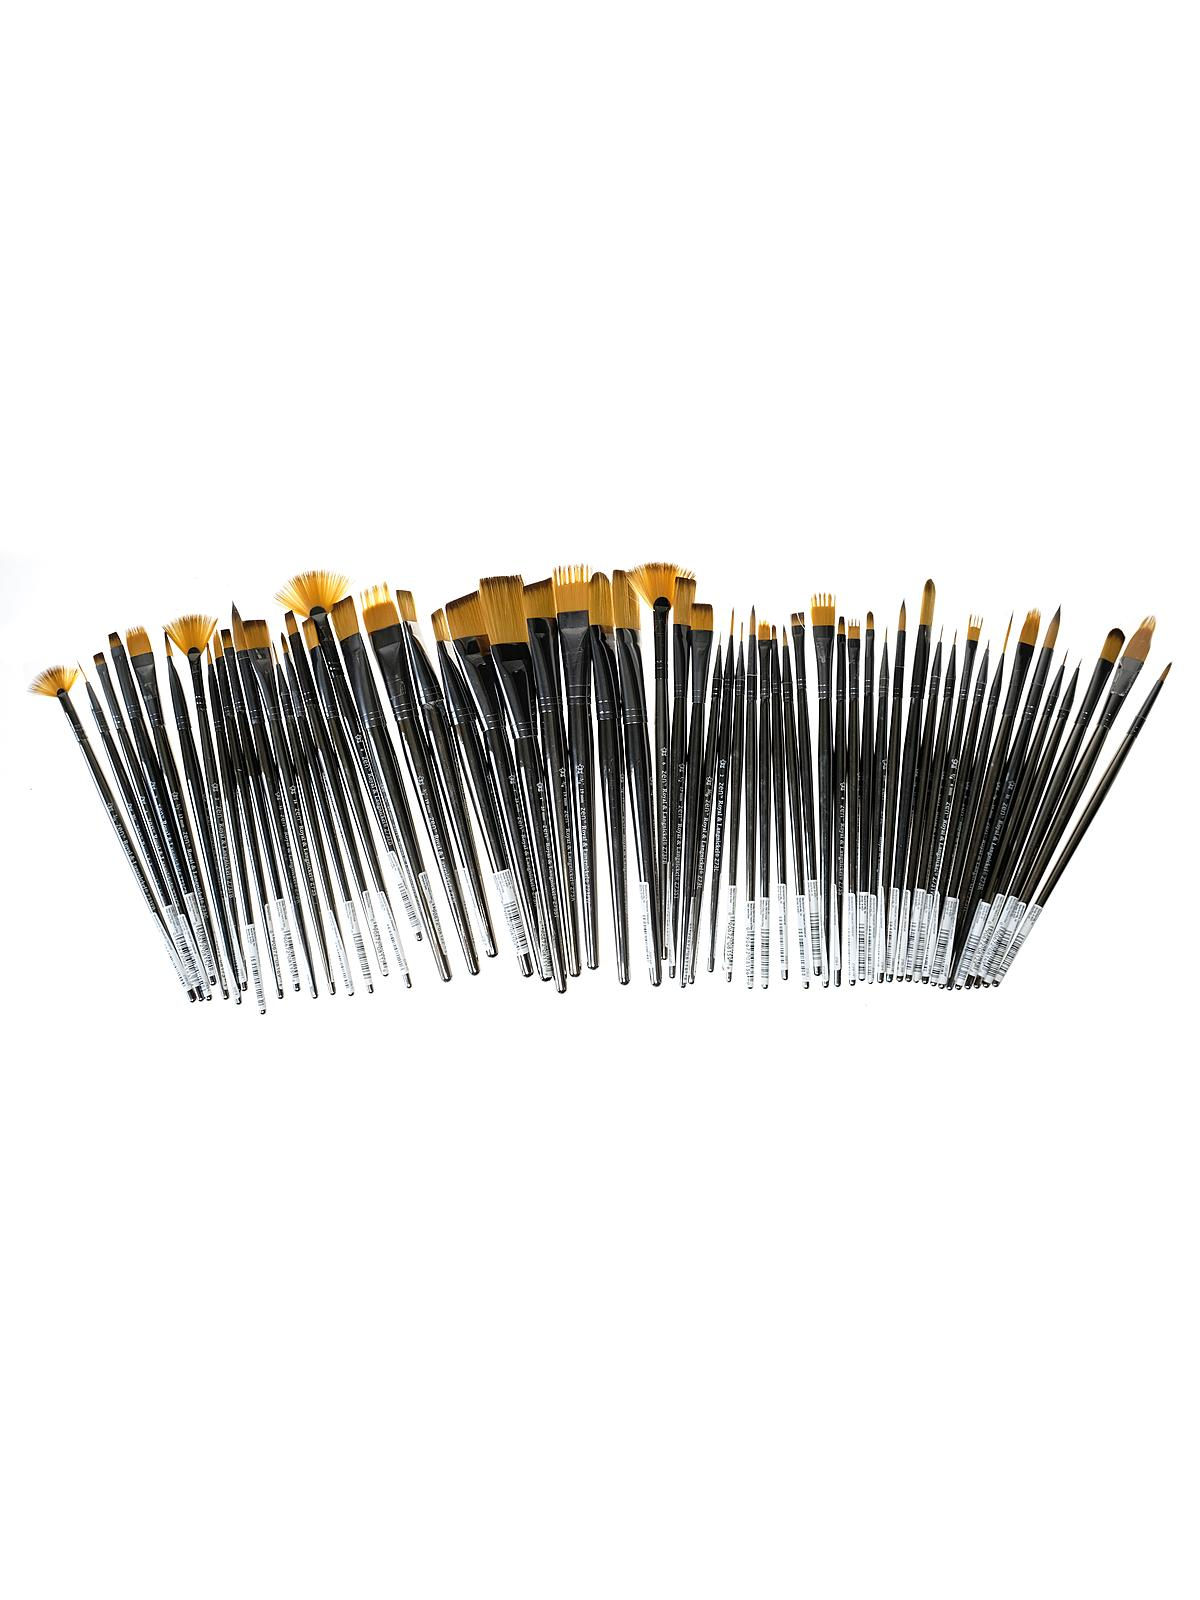 Royal & Langnickel - Zen Series 73 All Media Brushes